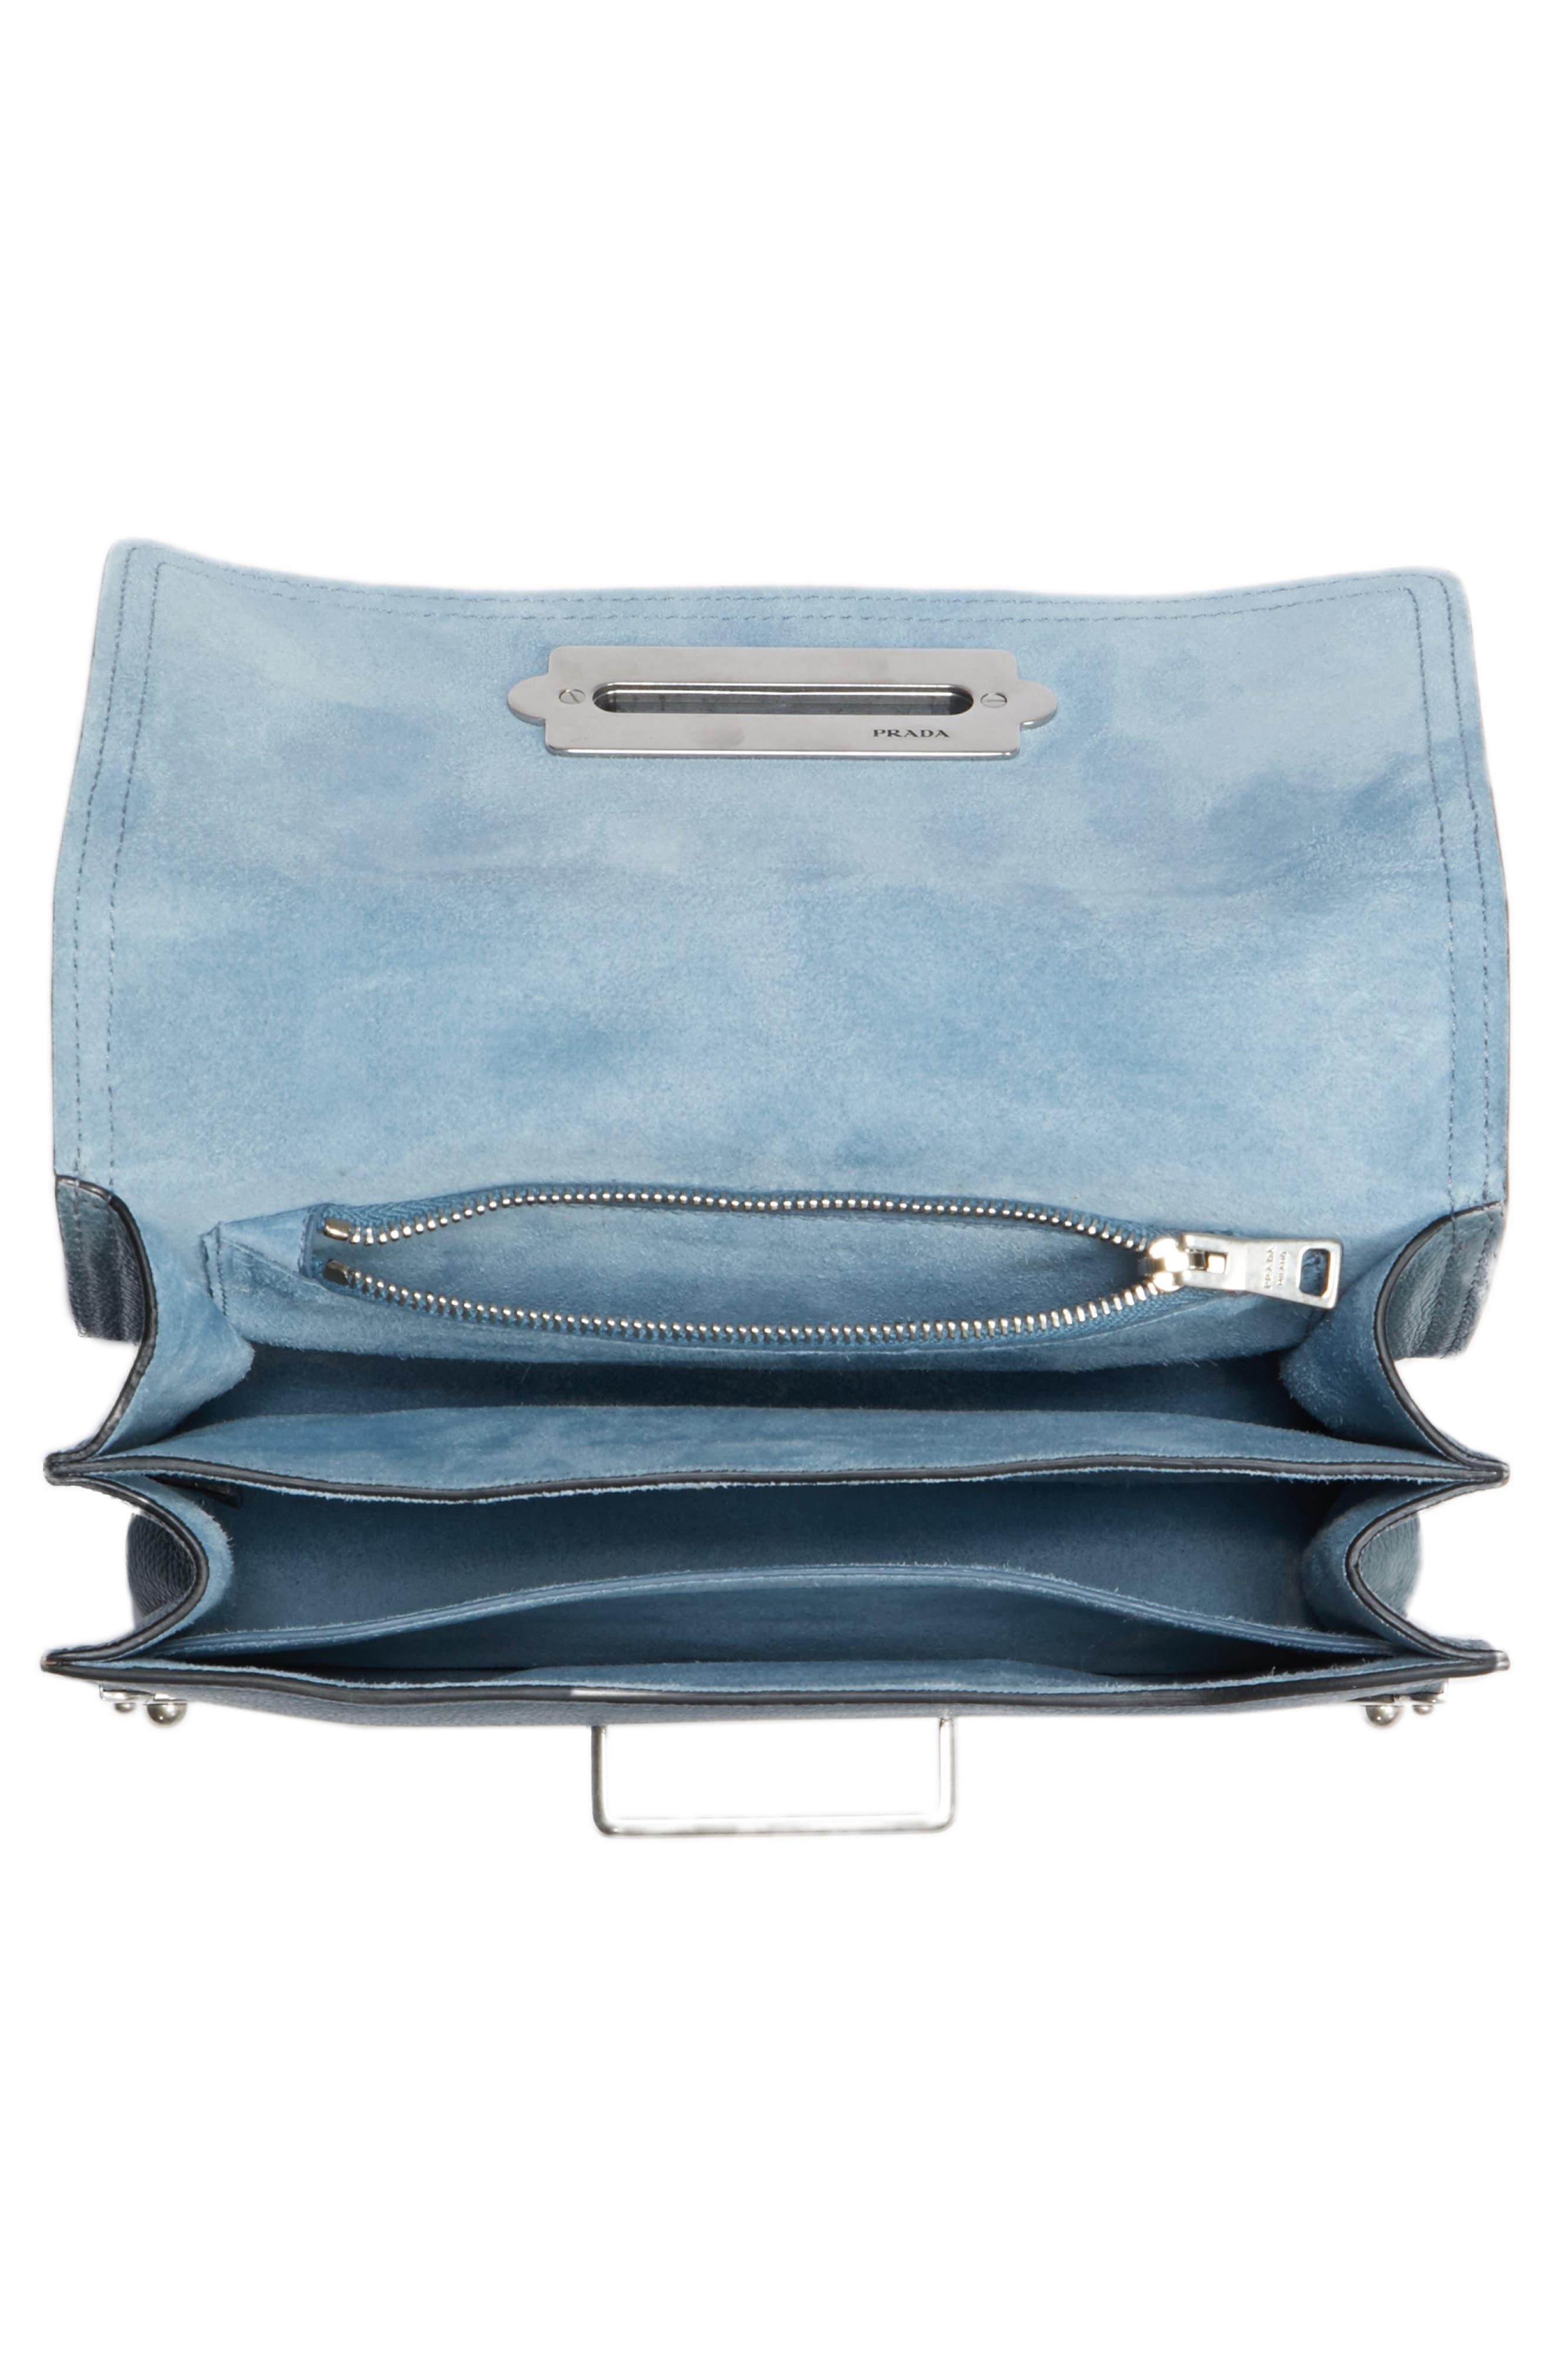 Cahier Glace Calfskin Convertible Shoulder Bag,                             Alternate thumbnail 4, color,                             MARINE/ ASTRALE 1